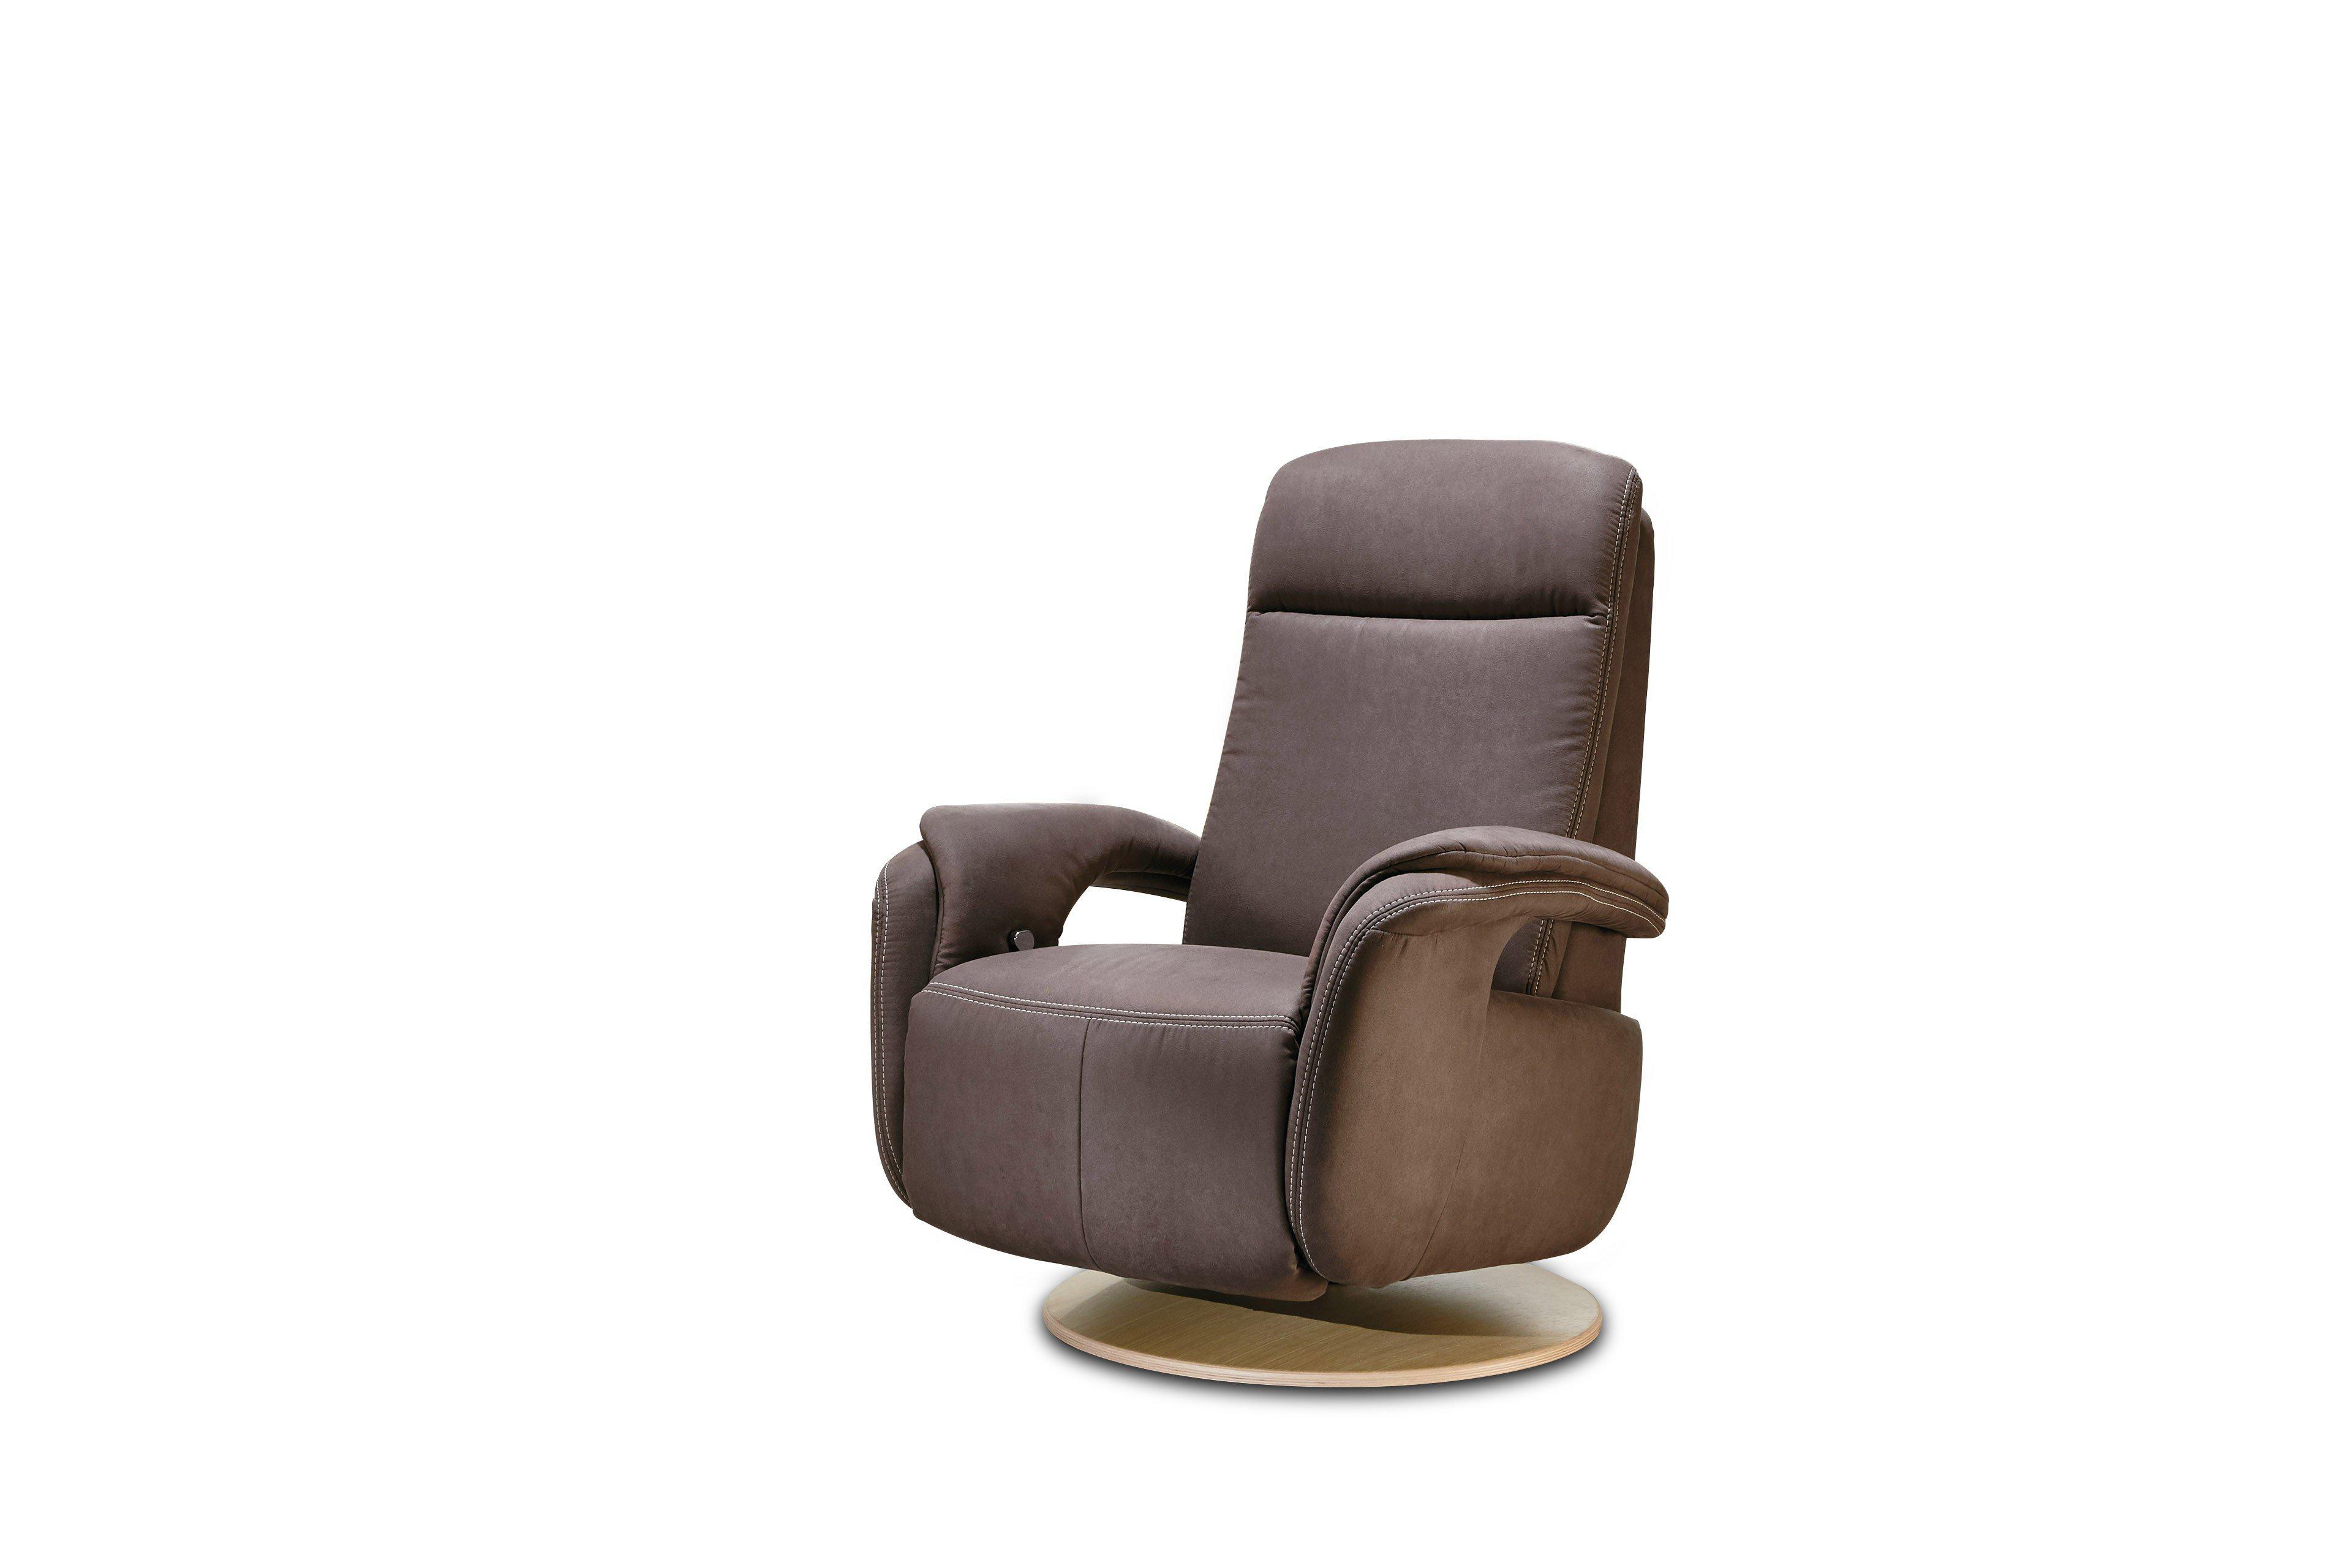 polipol raik relaxsessel in braun m bel letz ihr. Black Bedroom Furniture Sets. Home Design Ideas